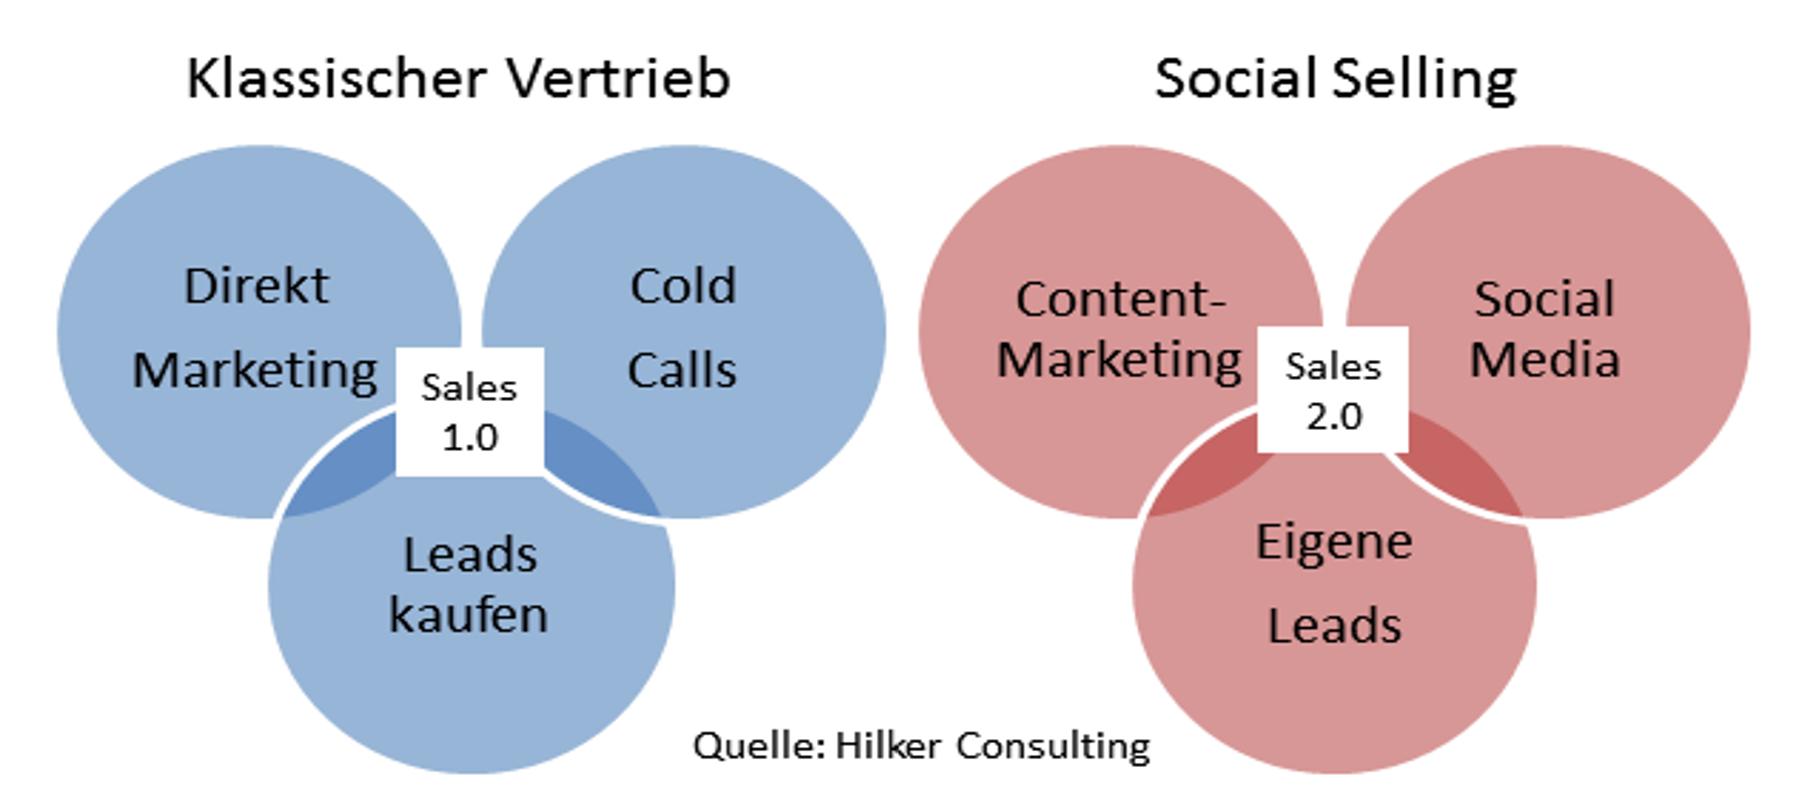 social selling versus klassischer Vertrieb